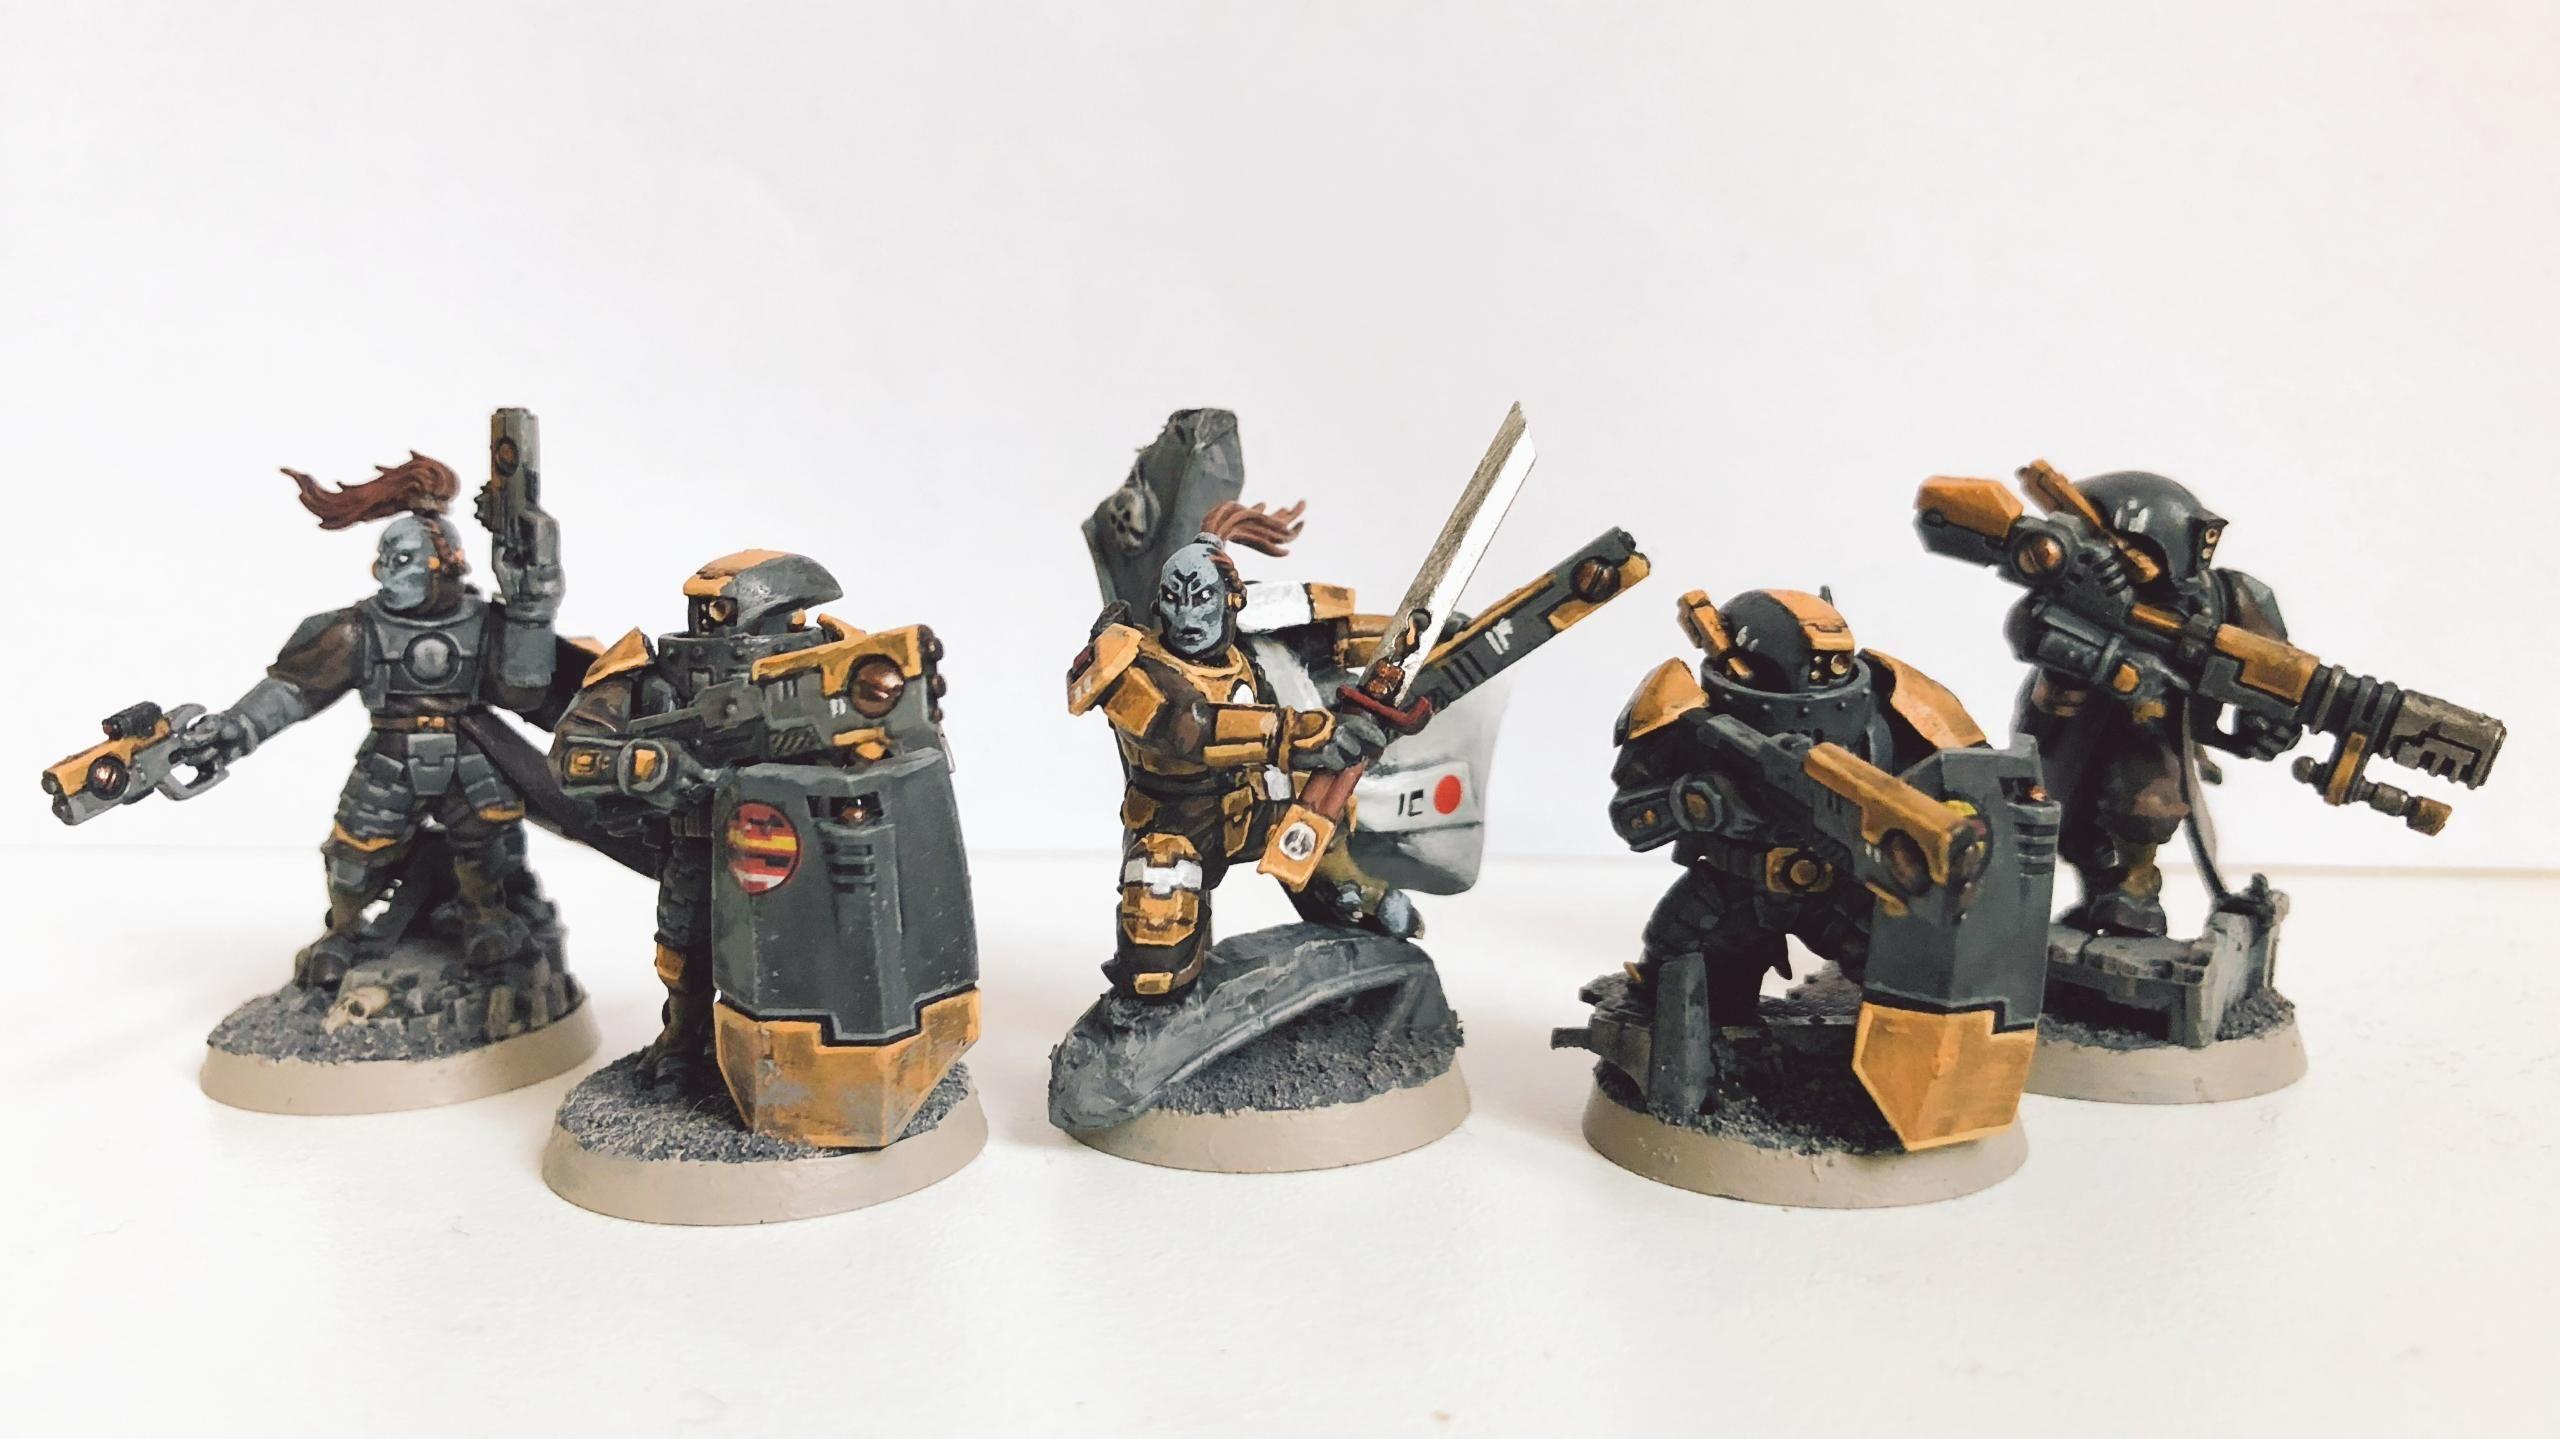 Warhammer 40k Artwork Bilder Primaris Space Marines Tau Kill Team Space Wolves